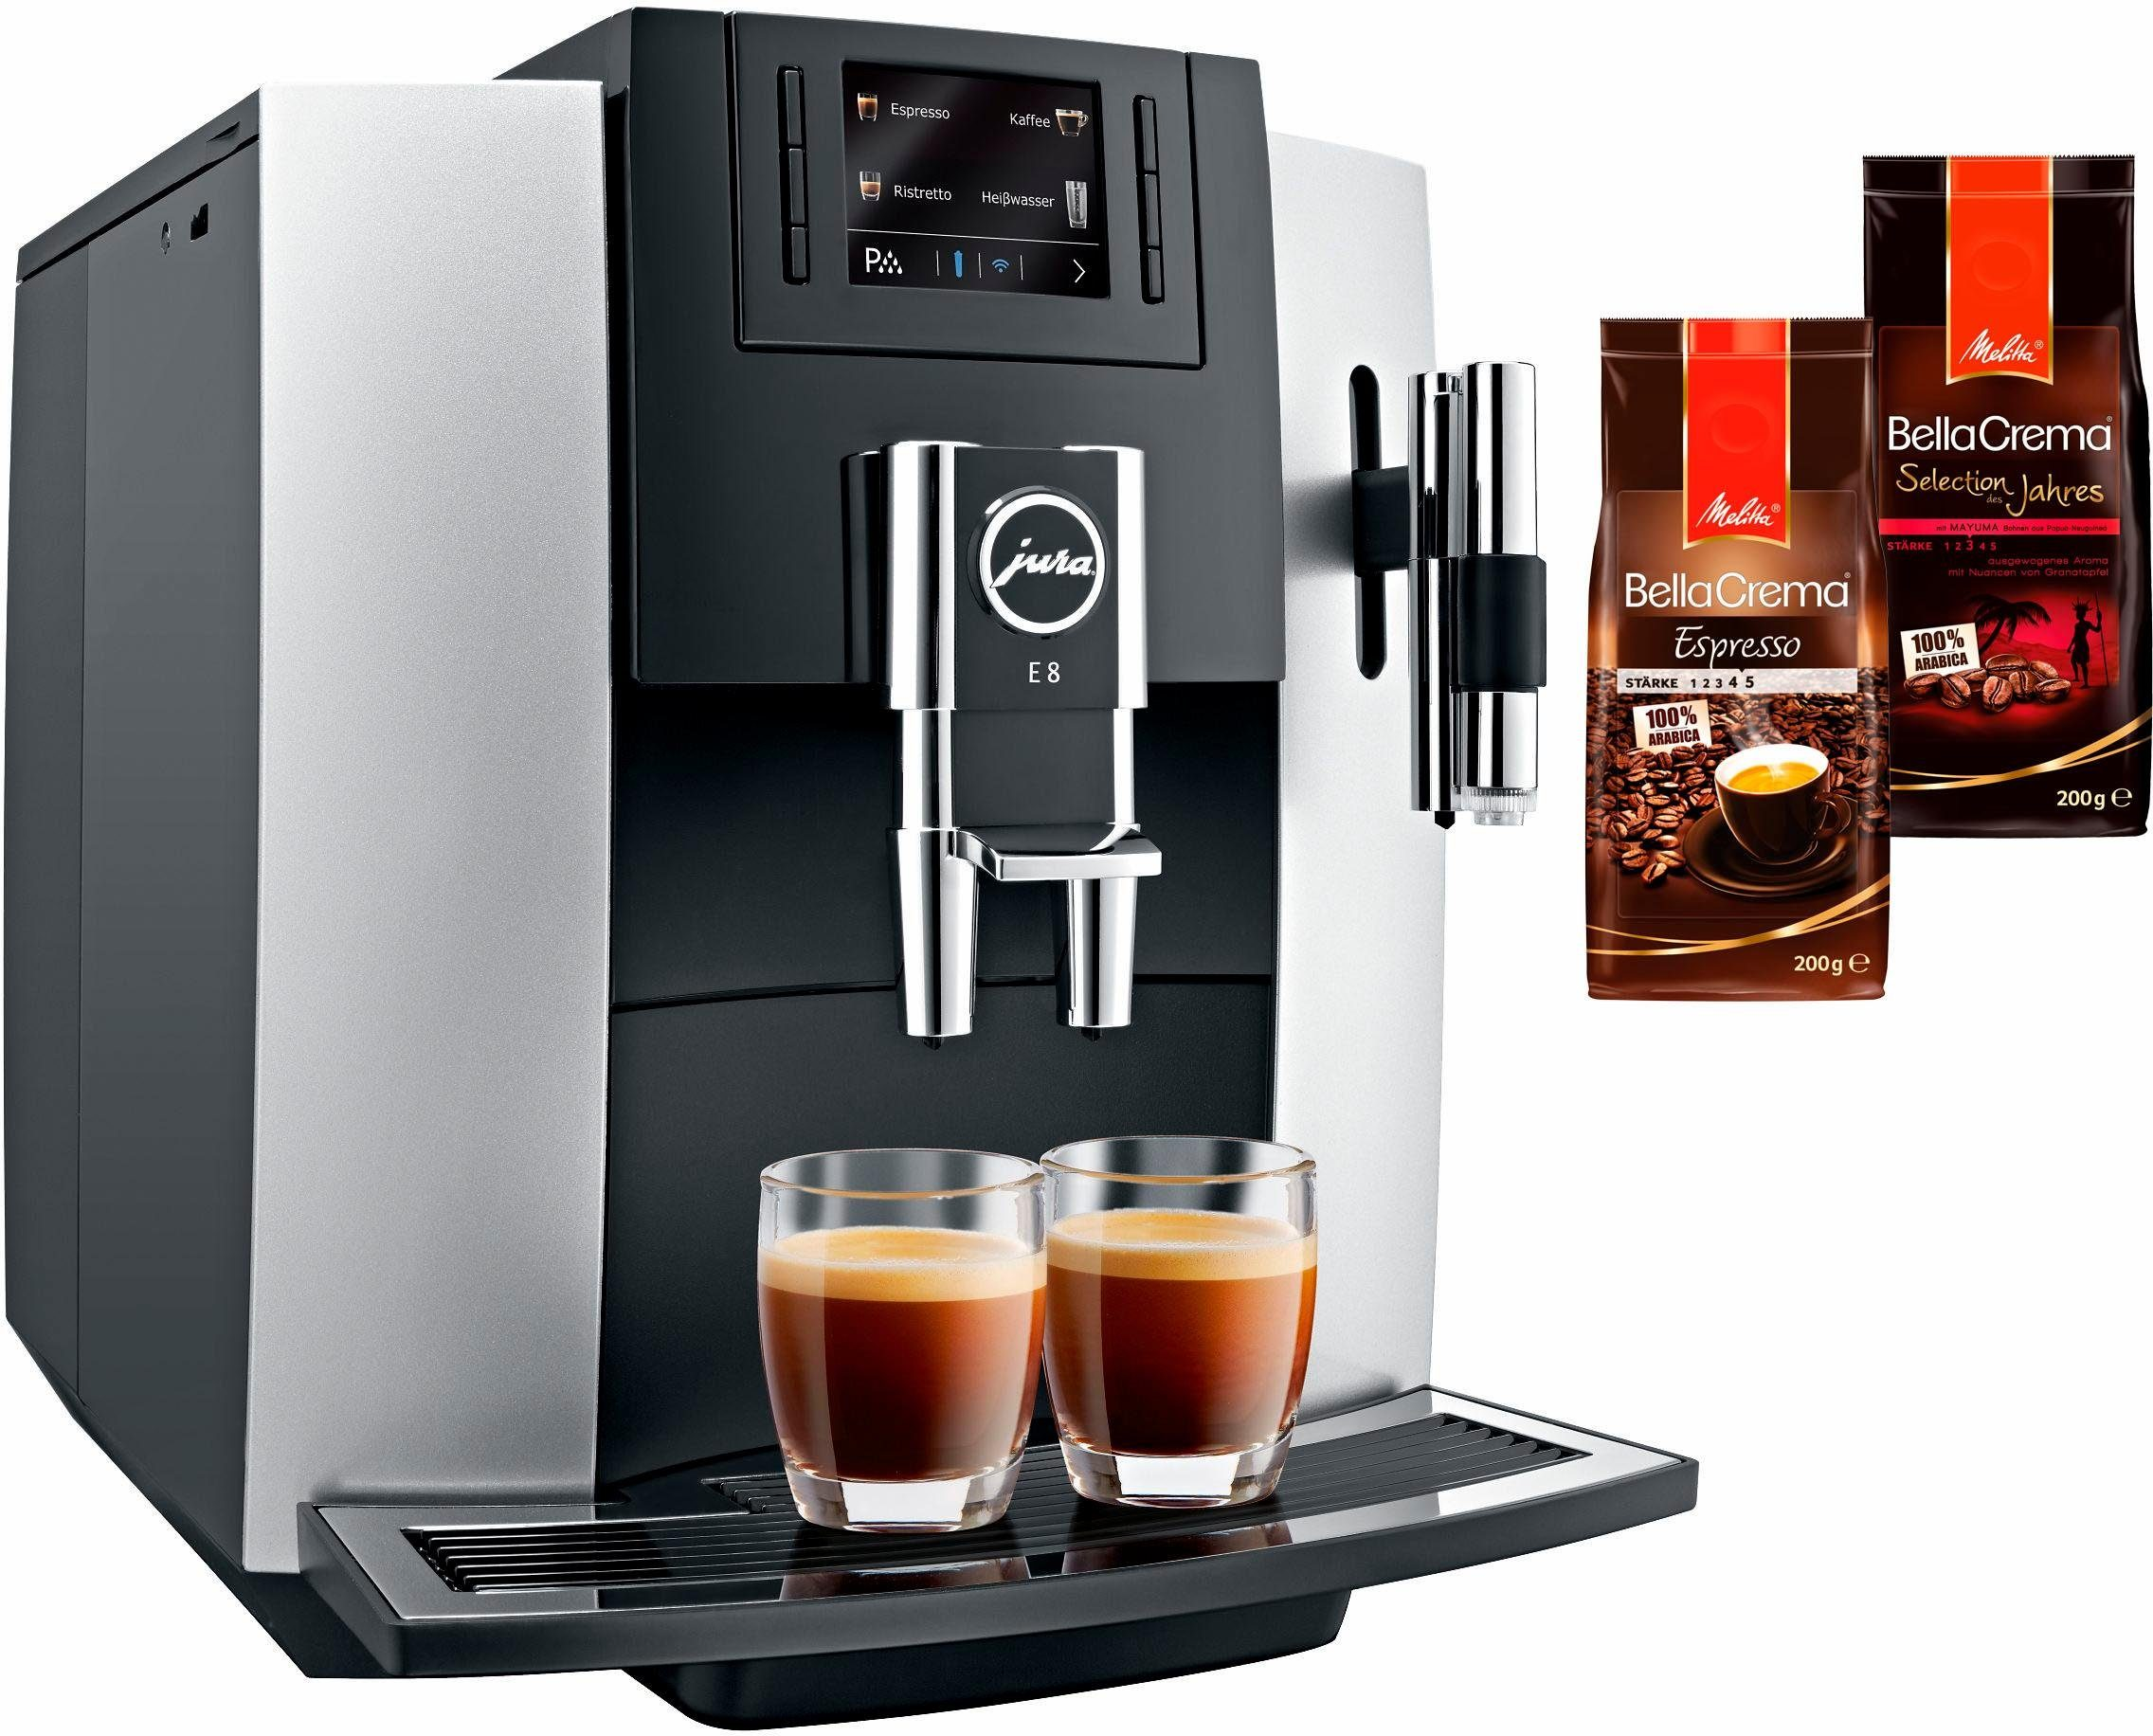 Jura Kaffeevollautomat 15084 E8, Kegelmahlwerk